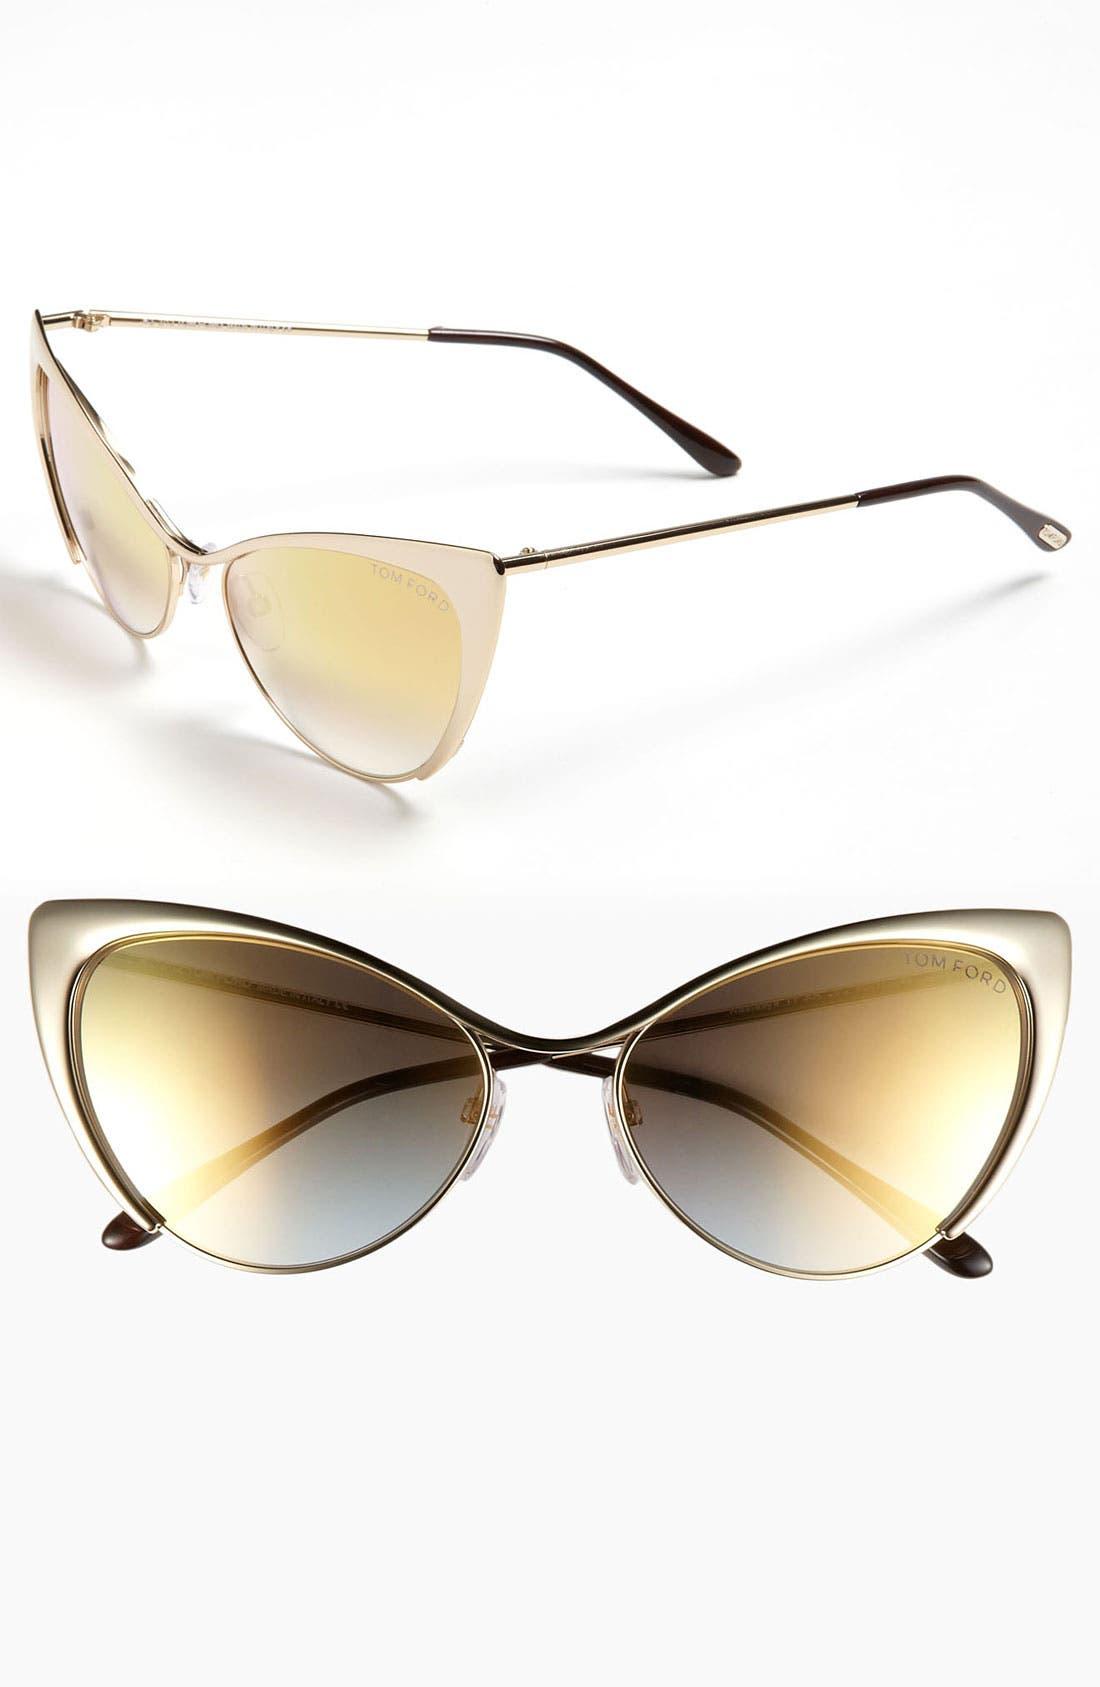 Main Image - Tom Ford 'Nastasya' 56mm Sunglasses